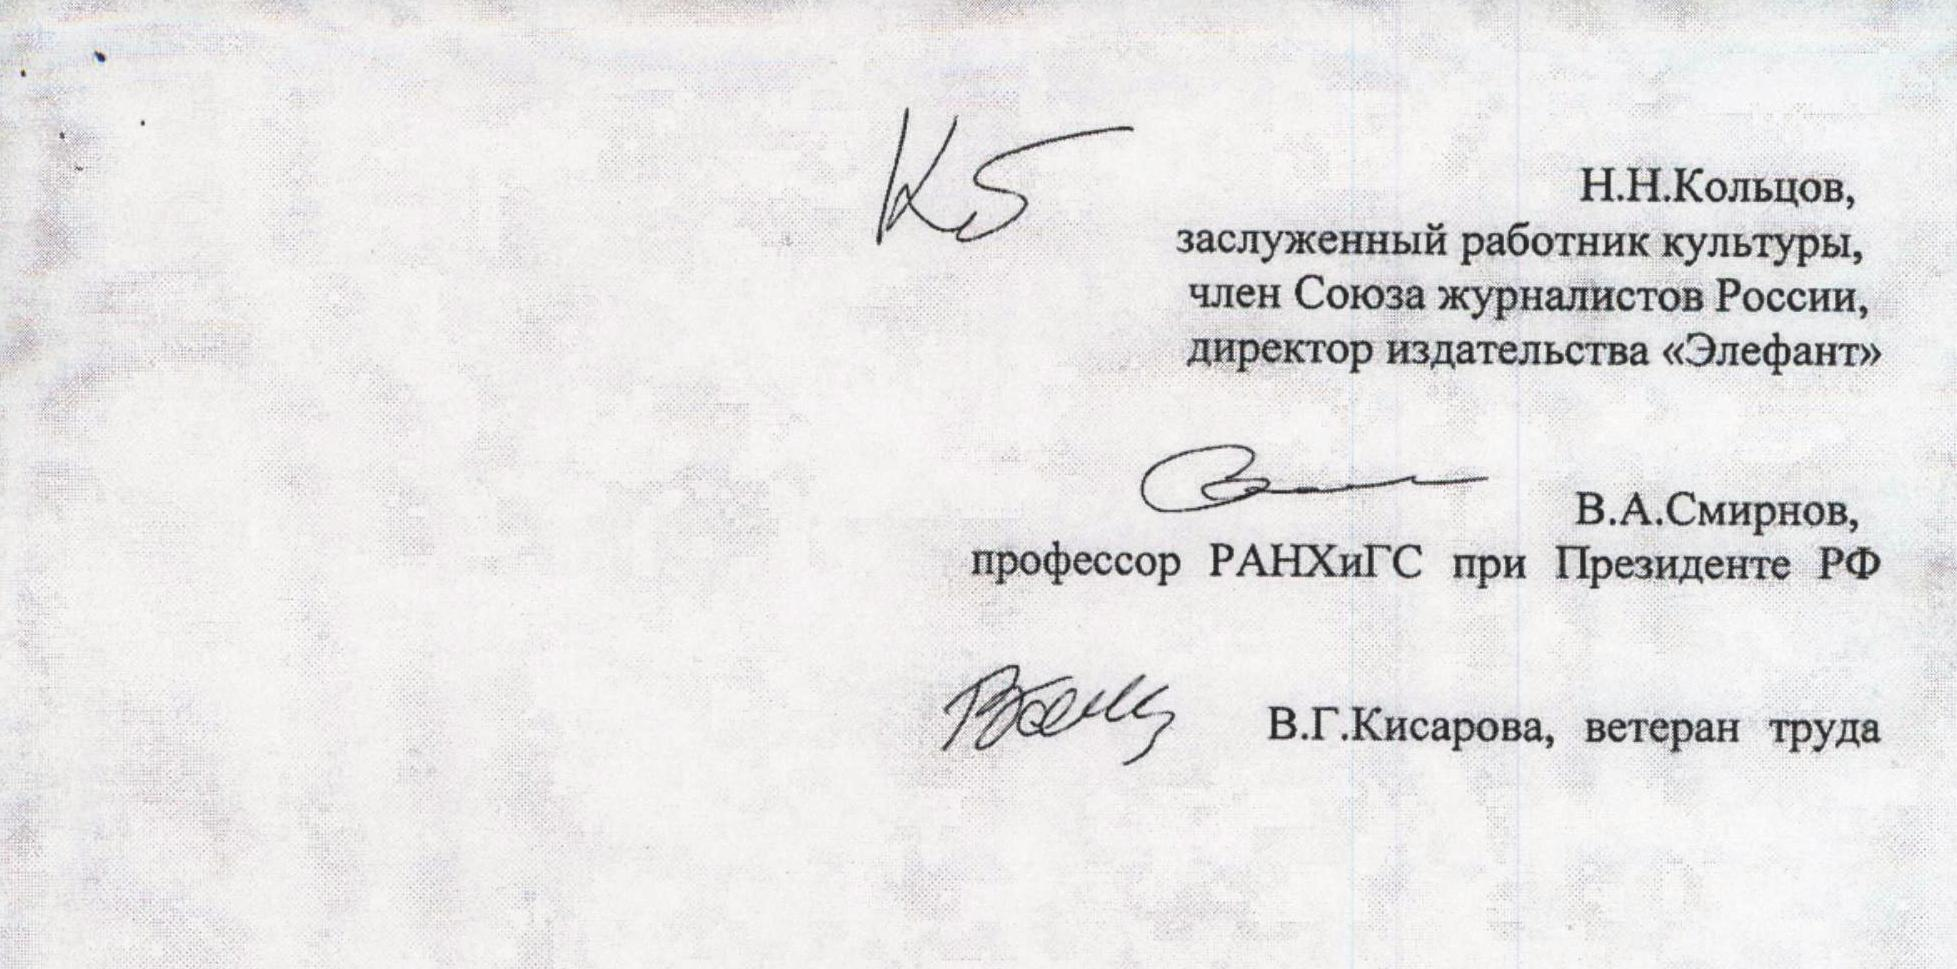 донос  Михайловский 12.11.13 004